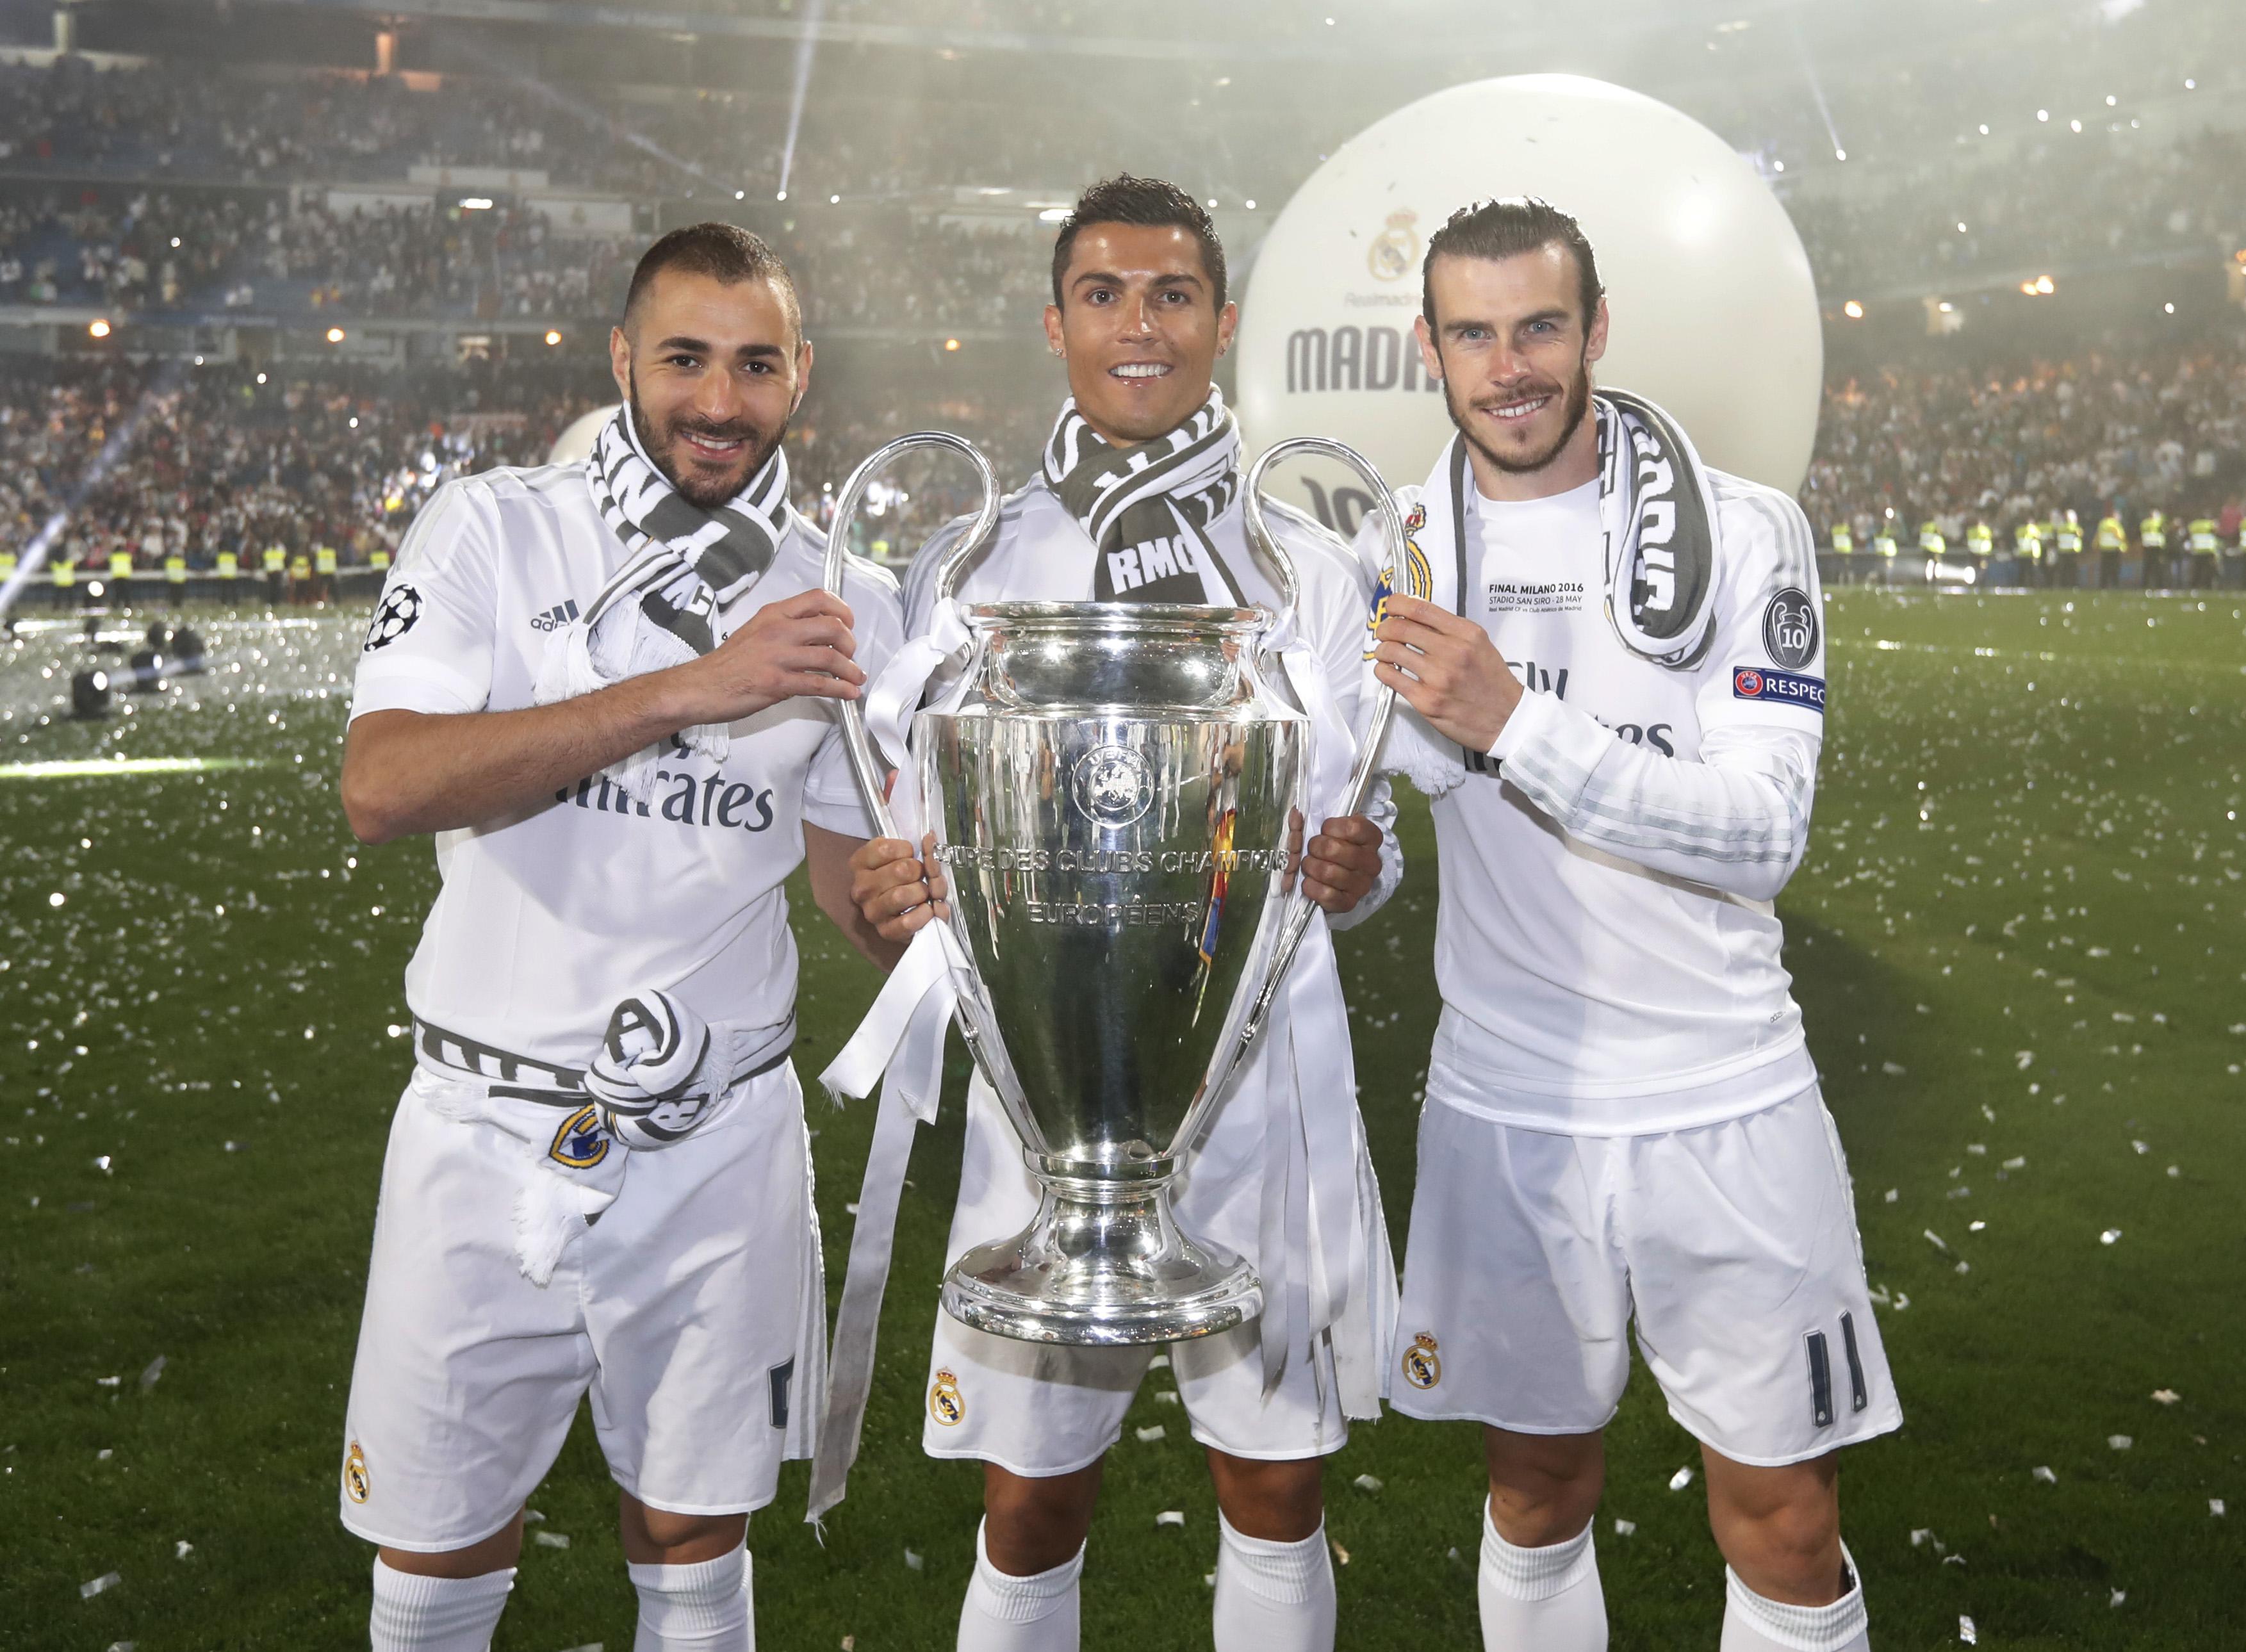 Oooo, Champions League friends